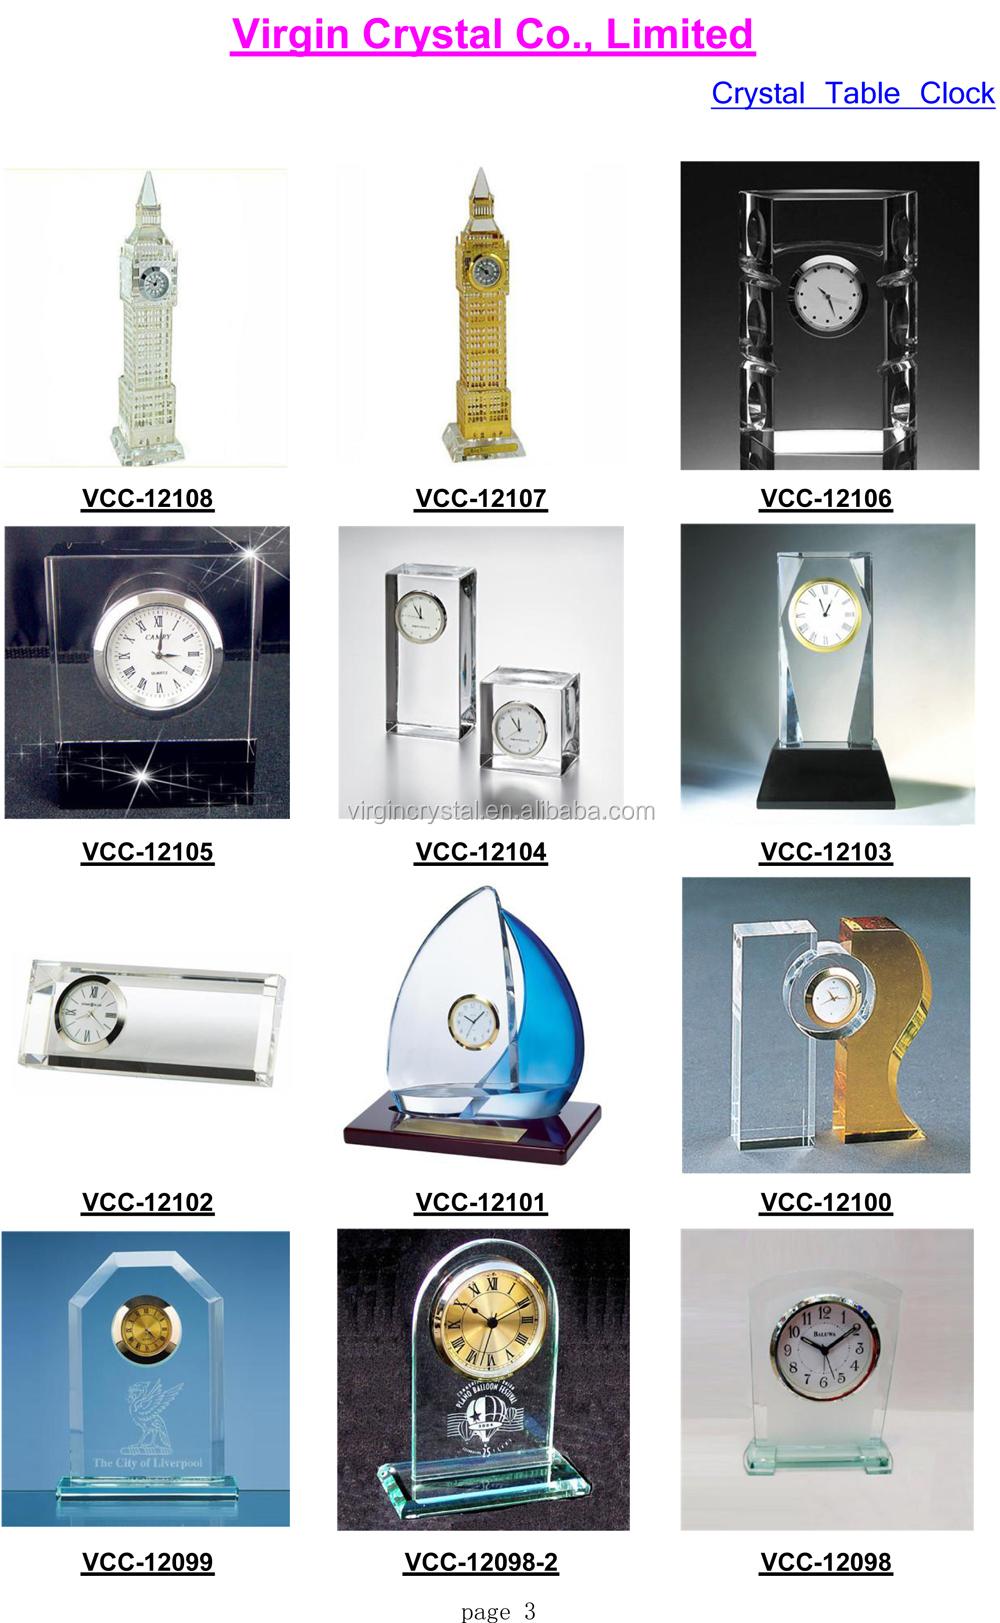 2016 Crystal Table Clock and Mechanical clock Catalog-3.jpg